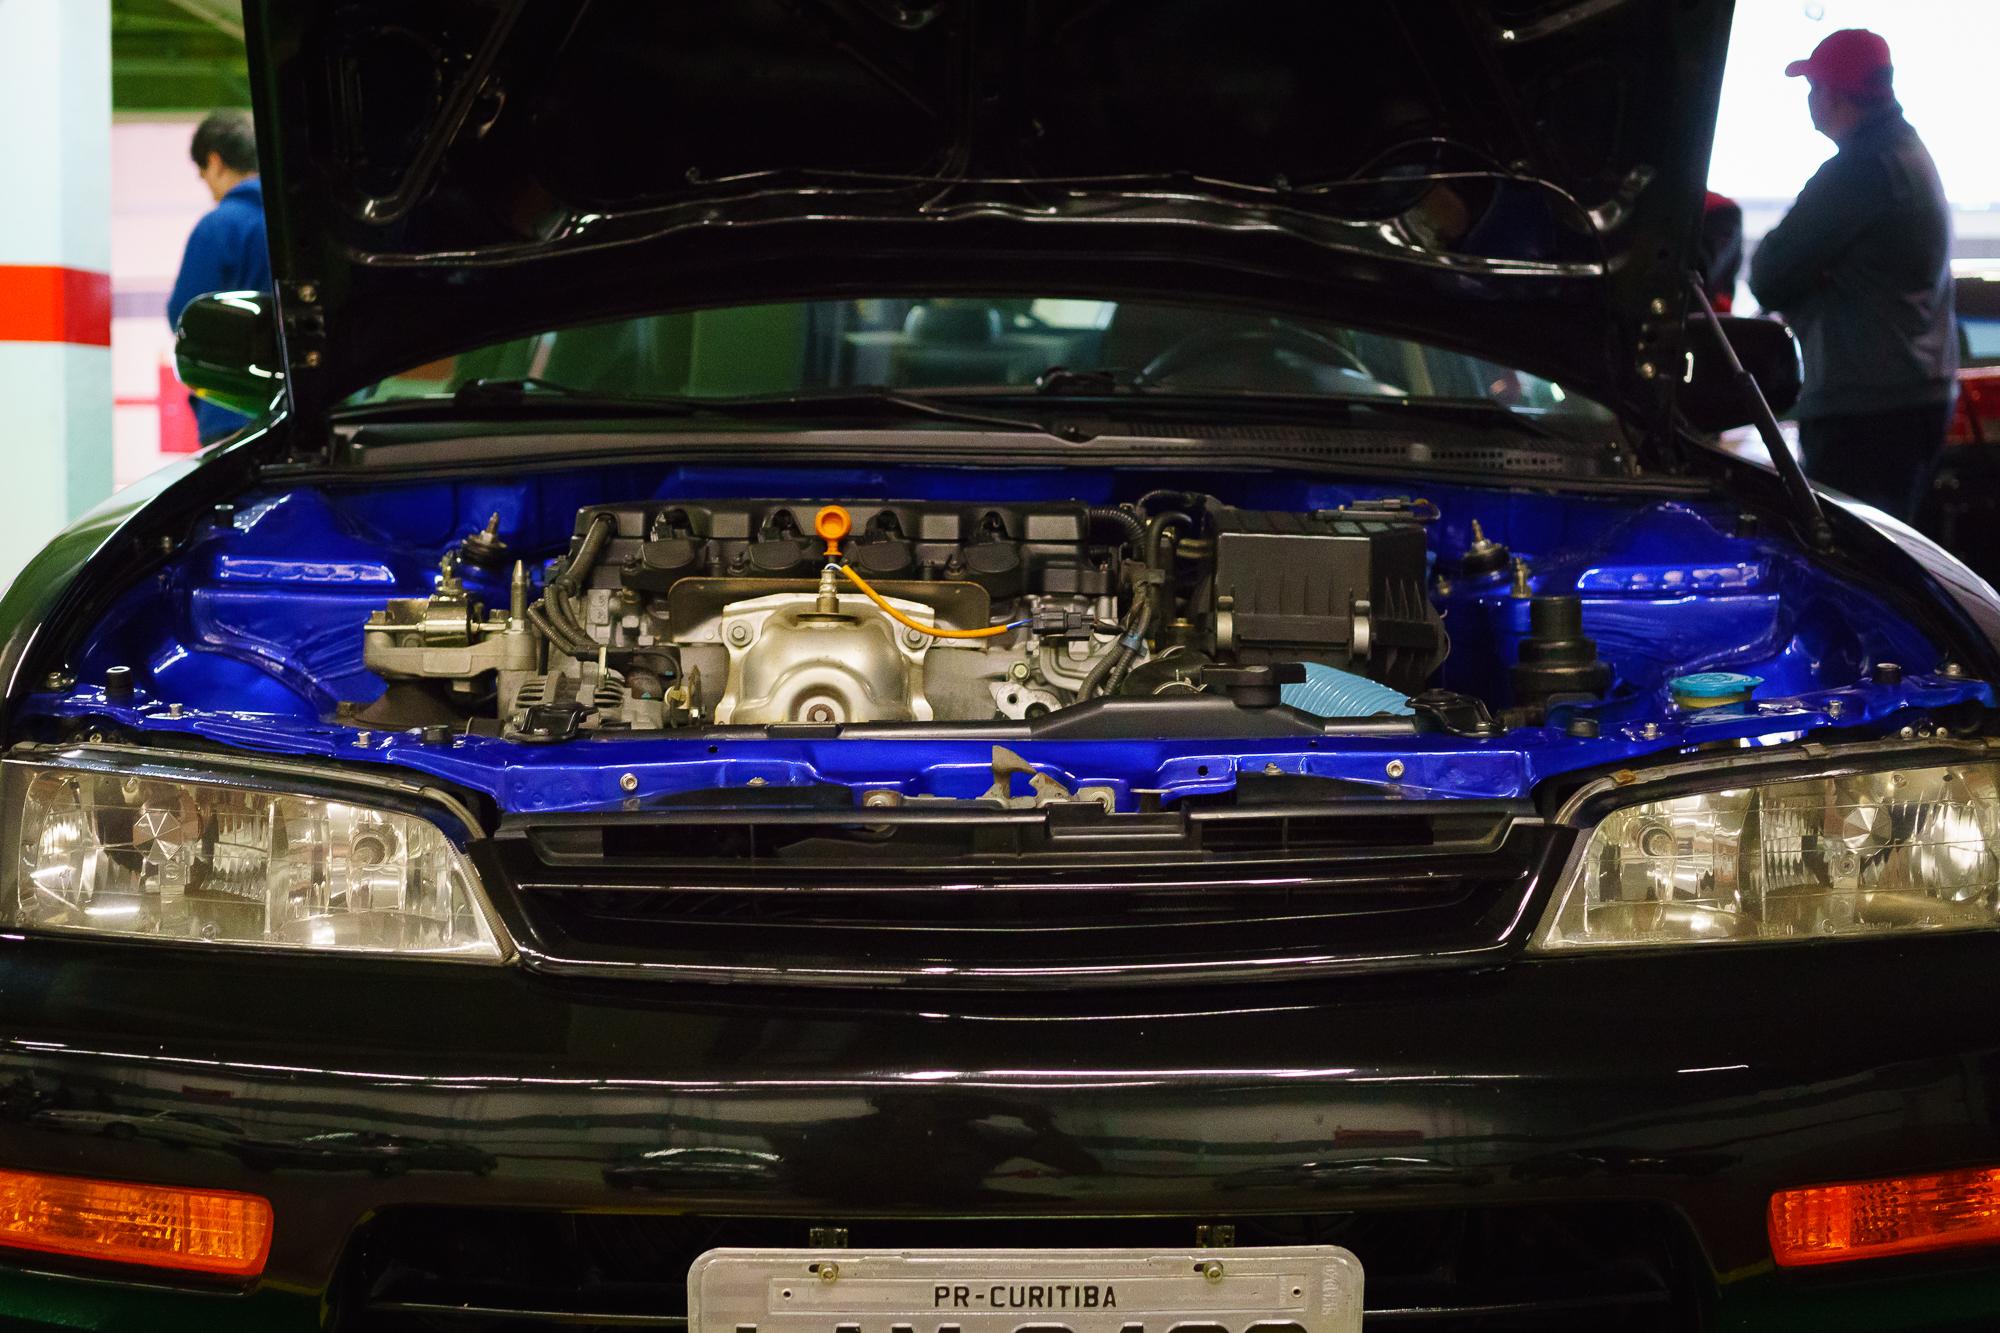 Honda Accord with Motorswap